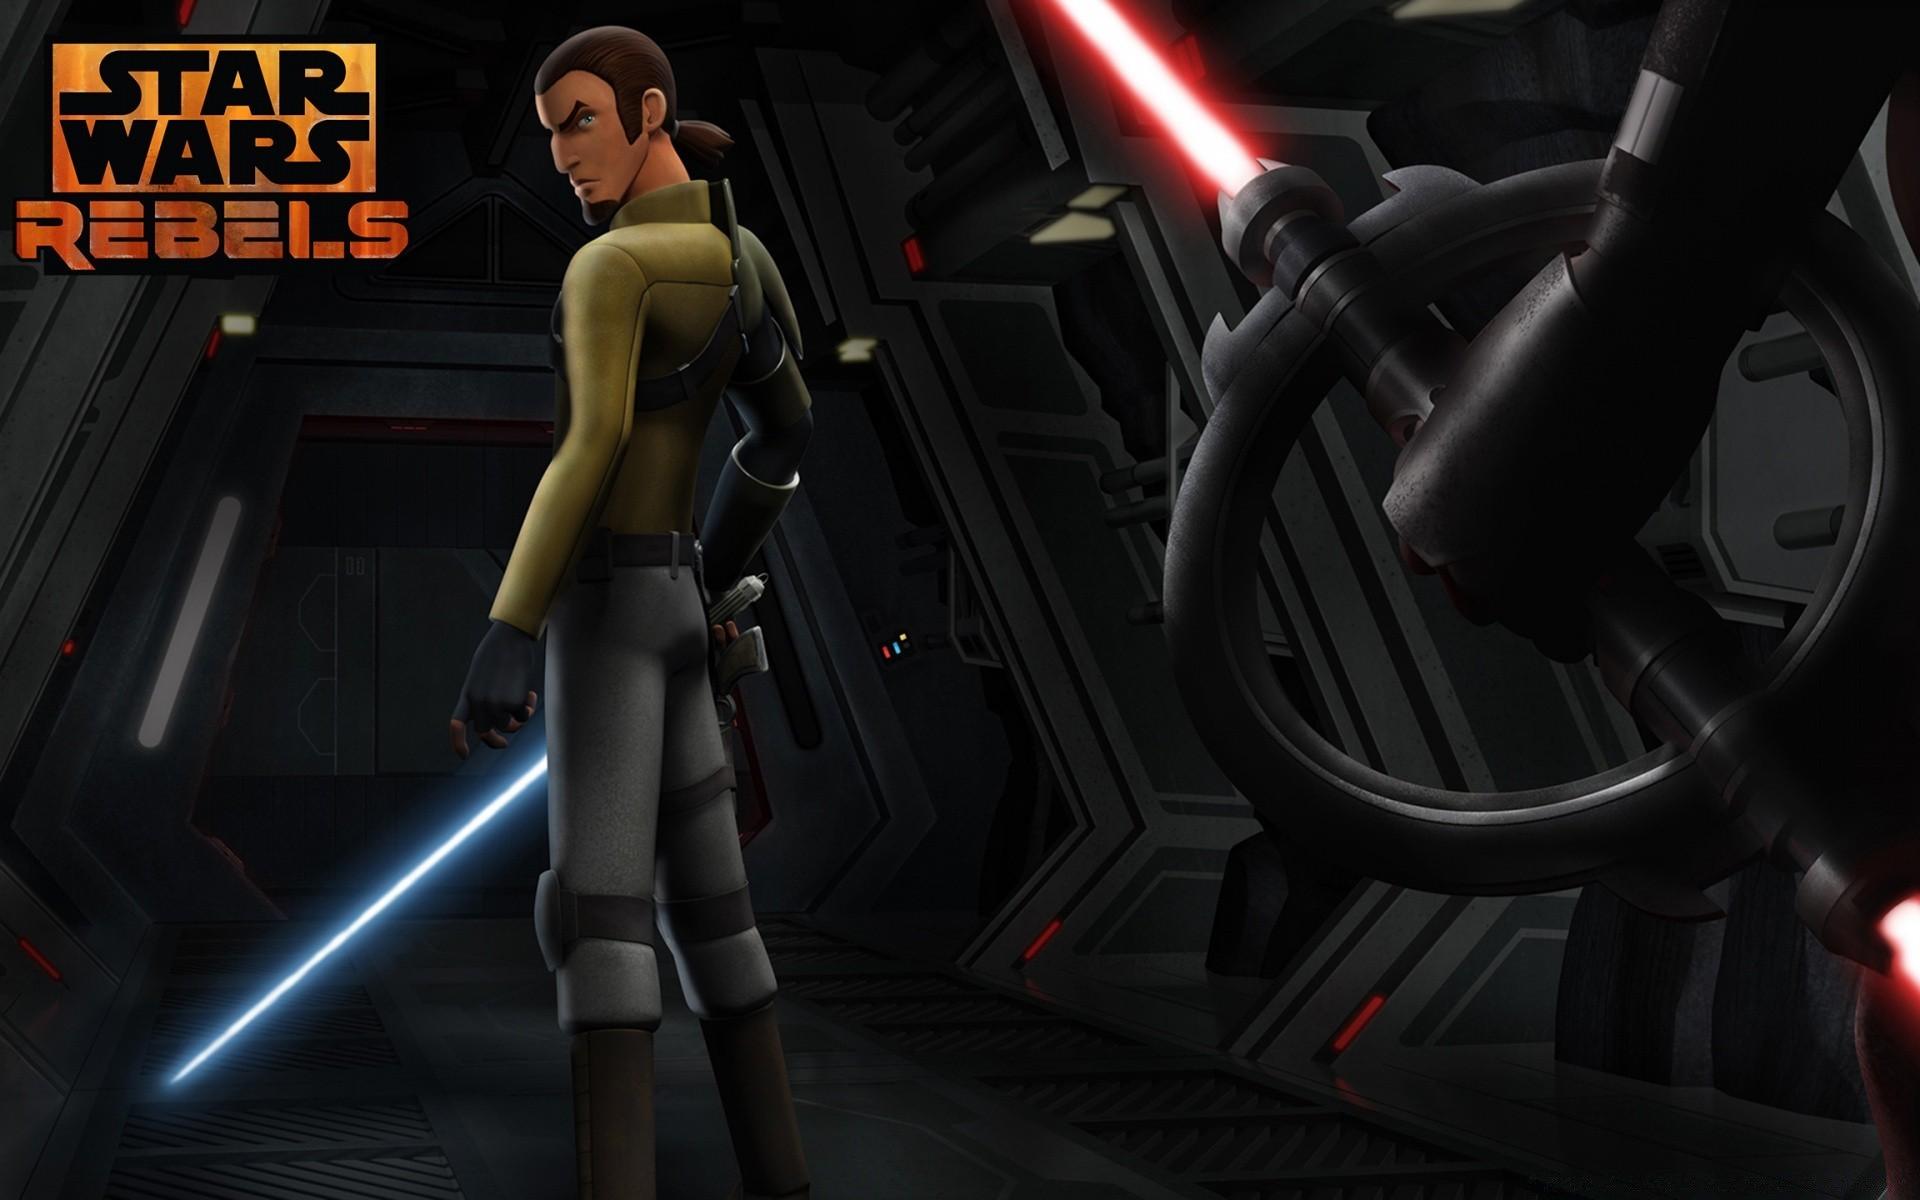 Star Wars Rebels Kanan Phone Wallpapers